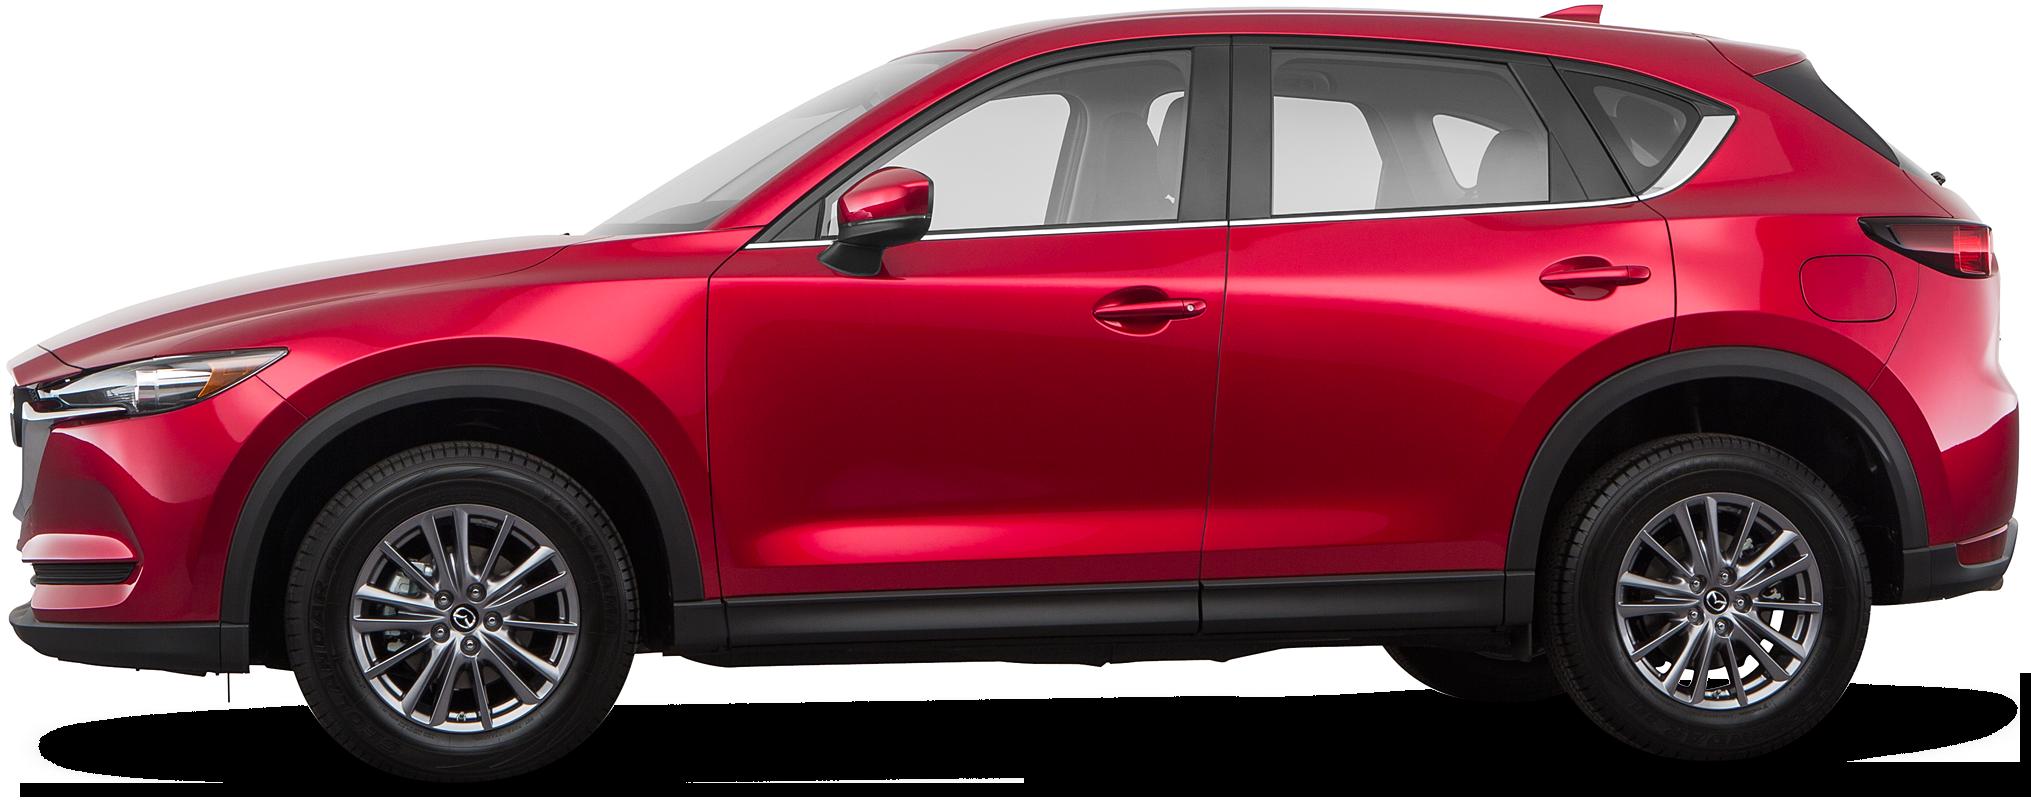 2020 Mazda Mazda CX-5 SUV Sport